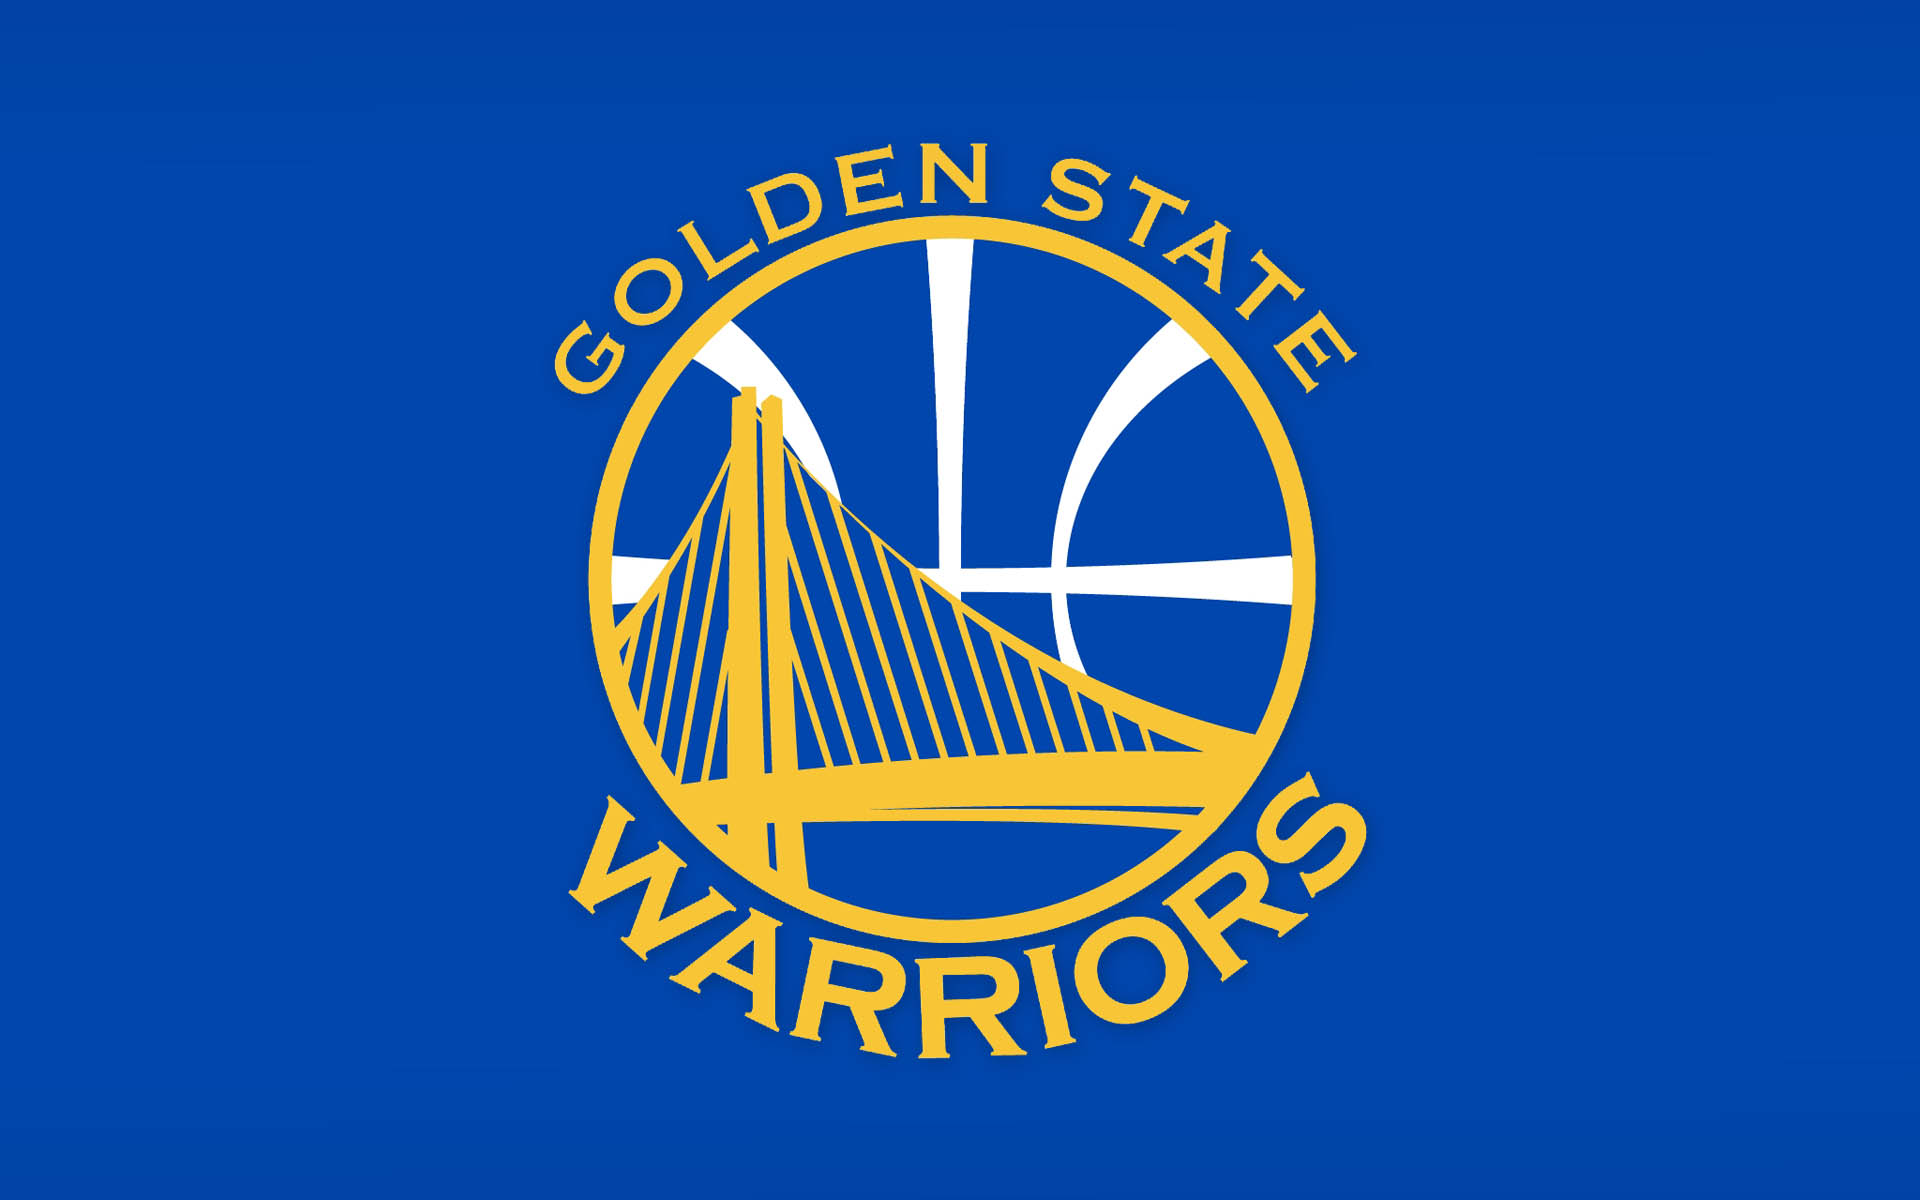 Golden State Warriors Wallpapers - Wallpaper Cave